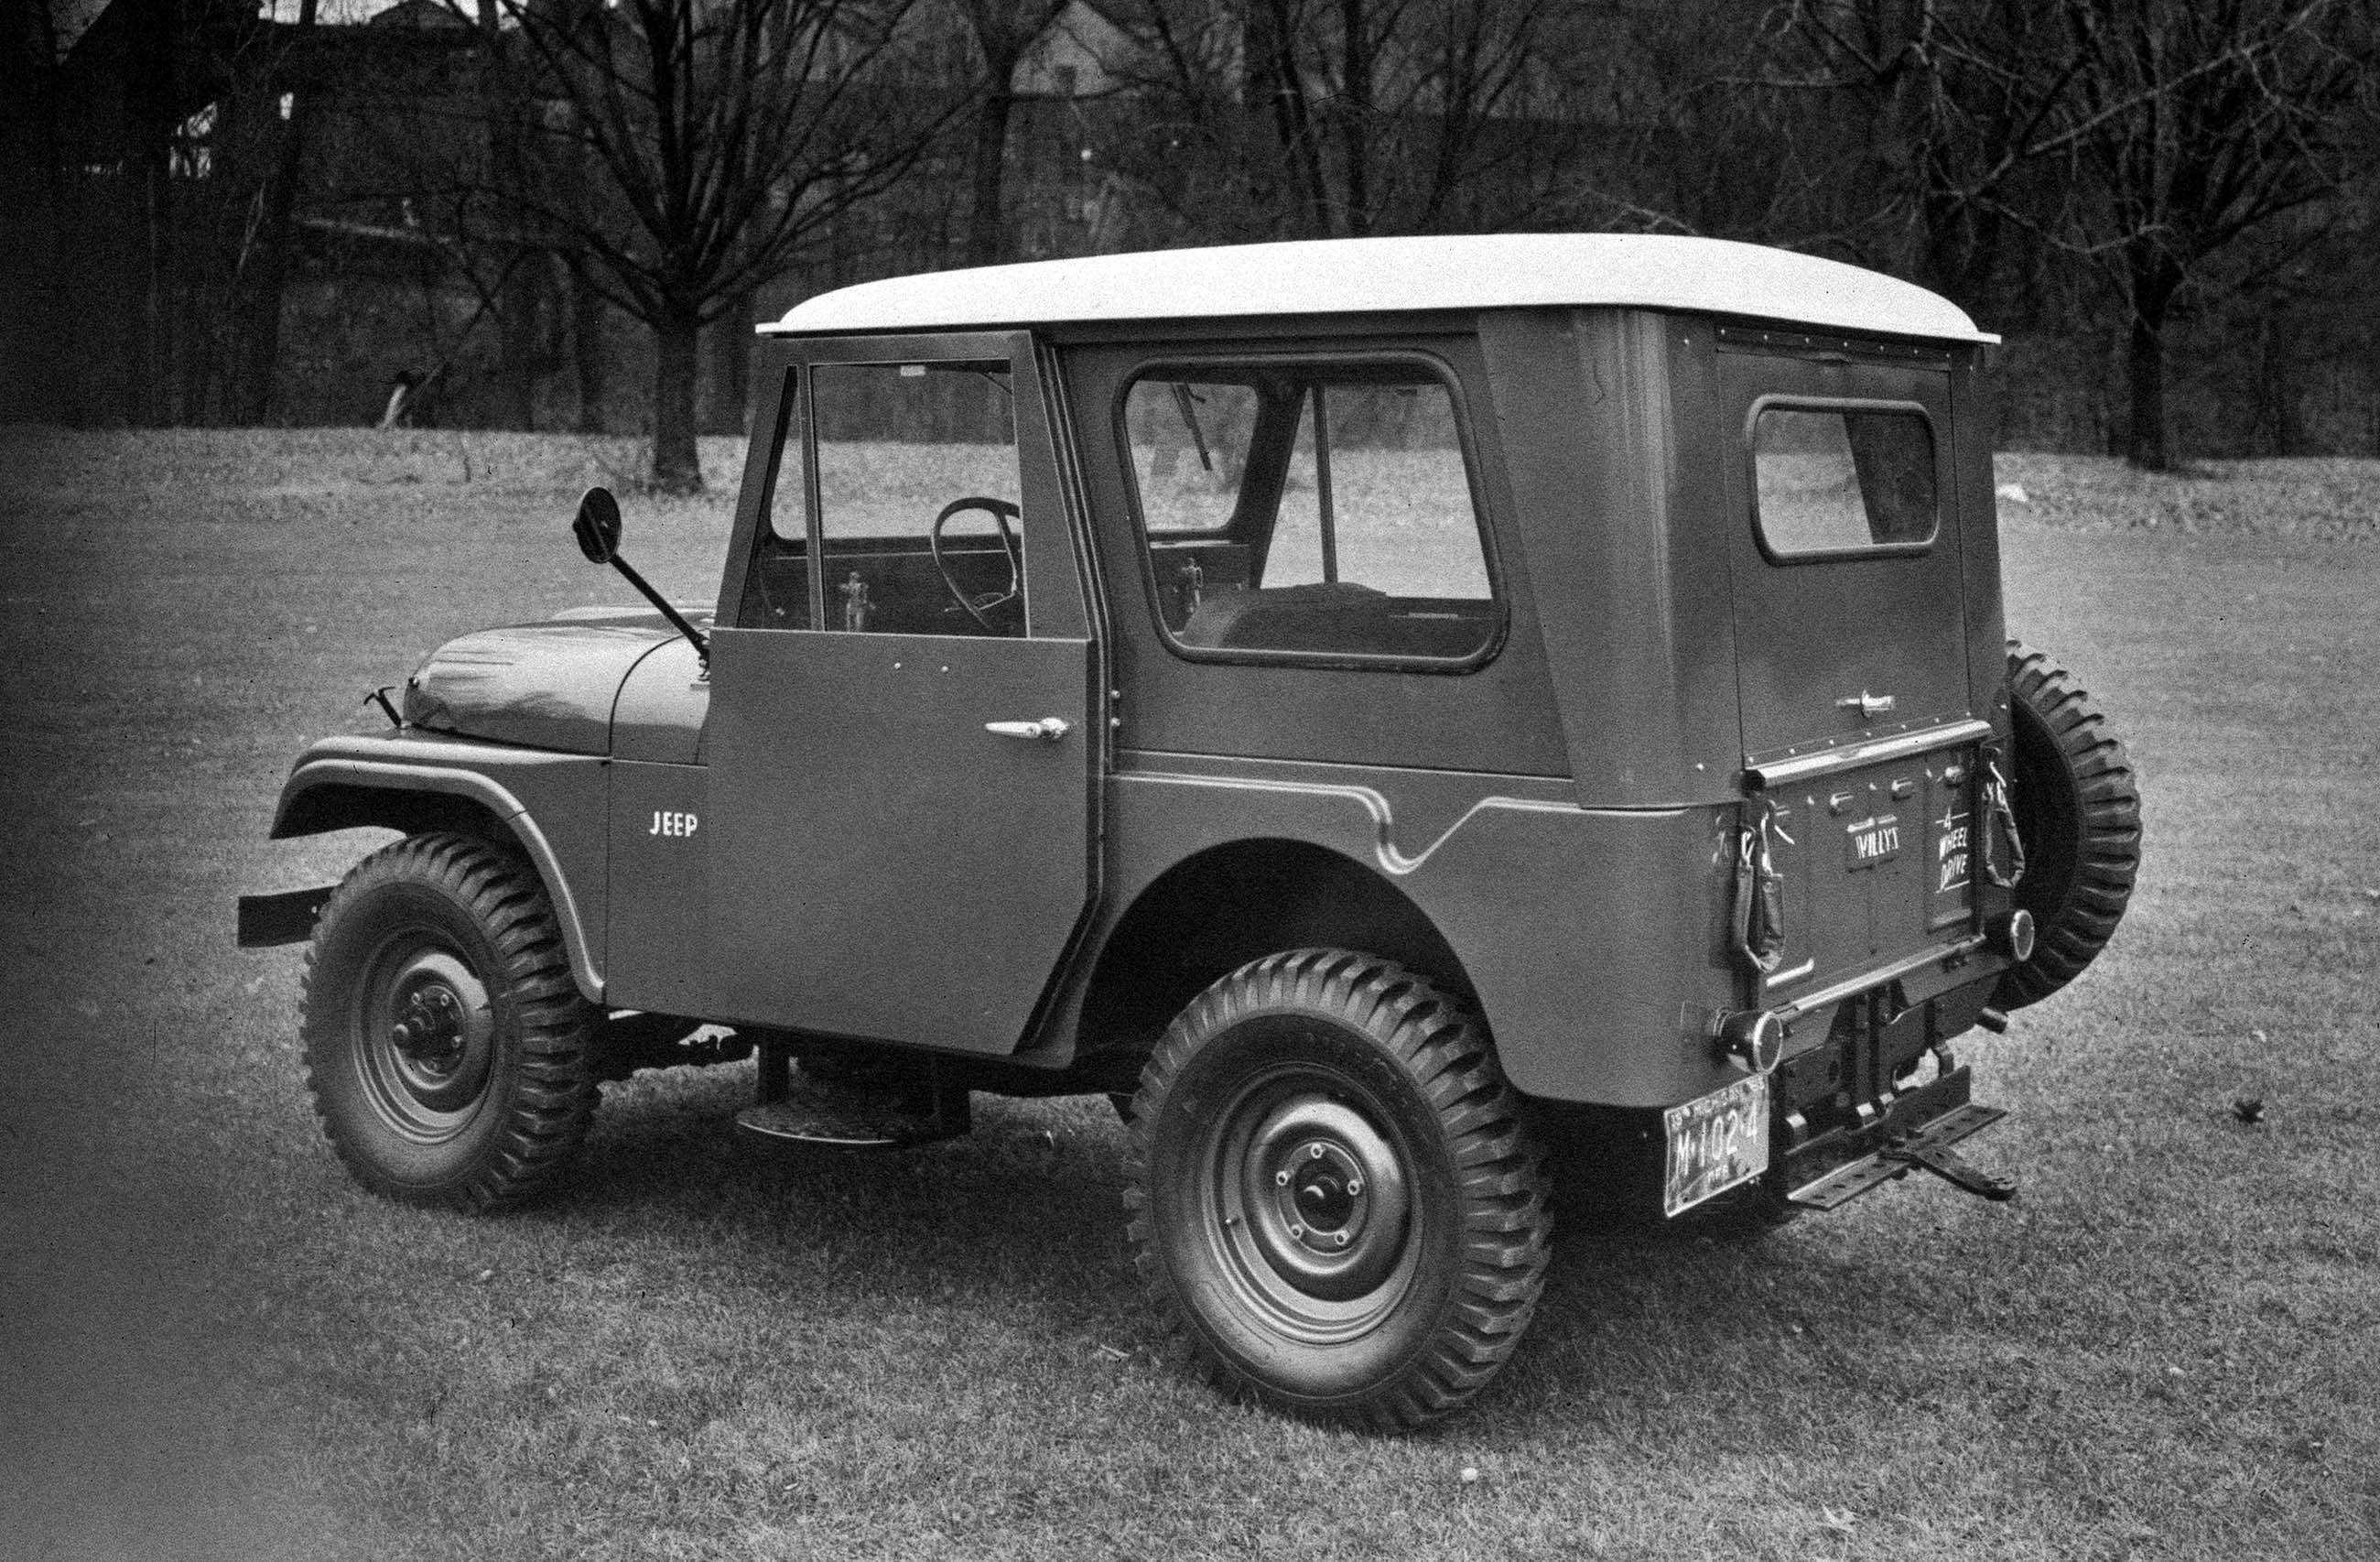 acme jeep cj5 hardtop